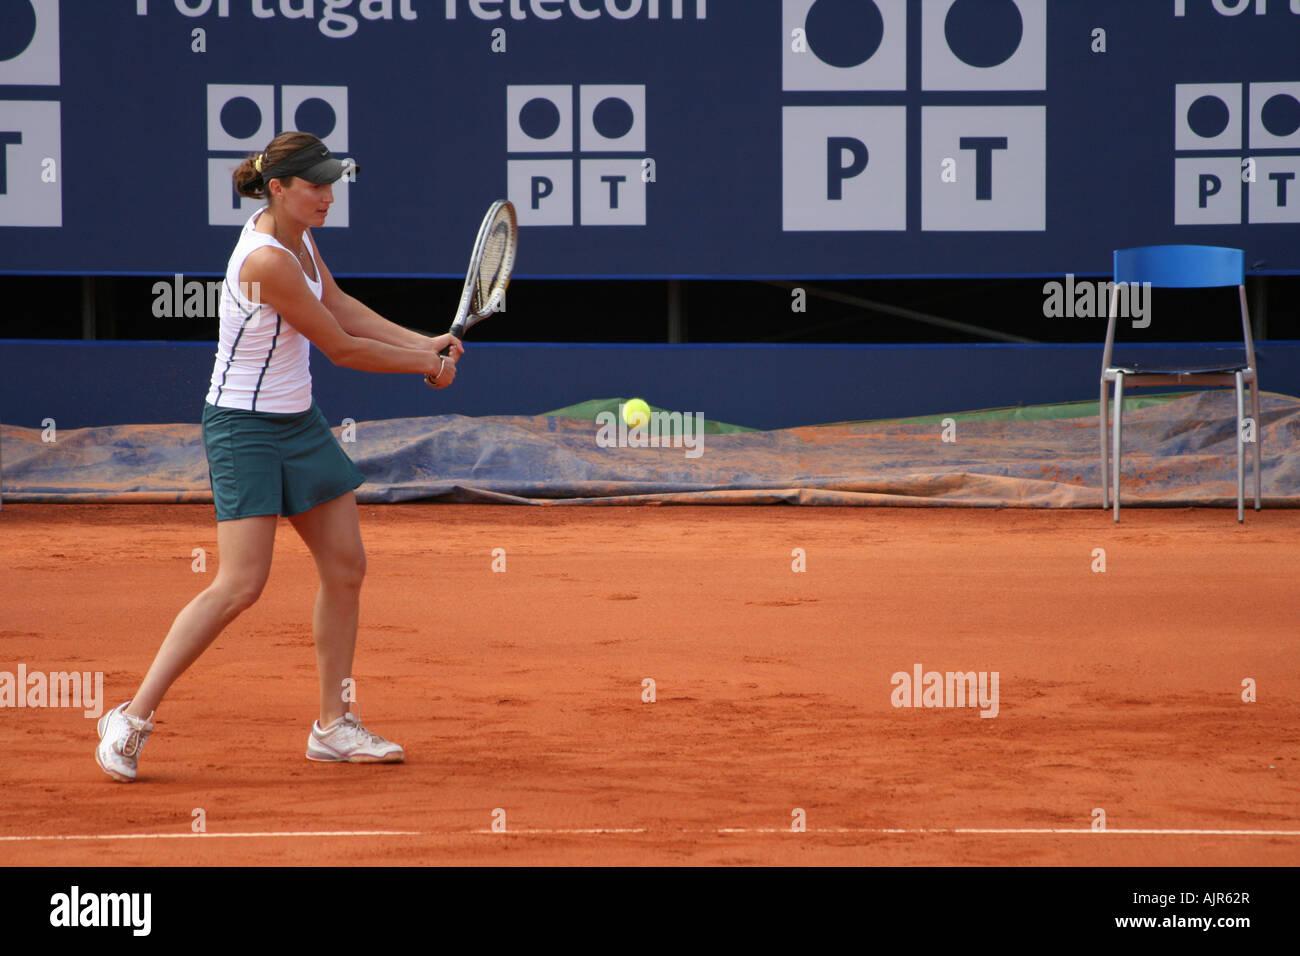 Estoril Open 2007 - Women's 1st round qualifying - Iveta Benesova vs Conchita Martinez Granados - Stock Image